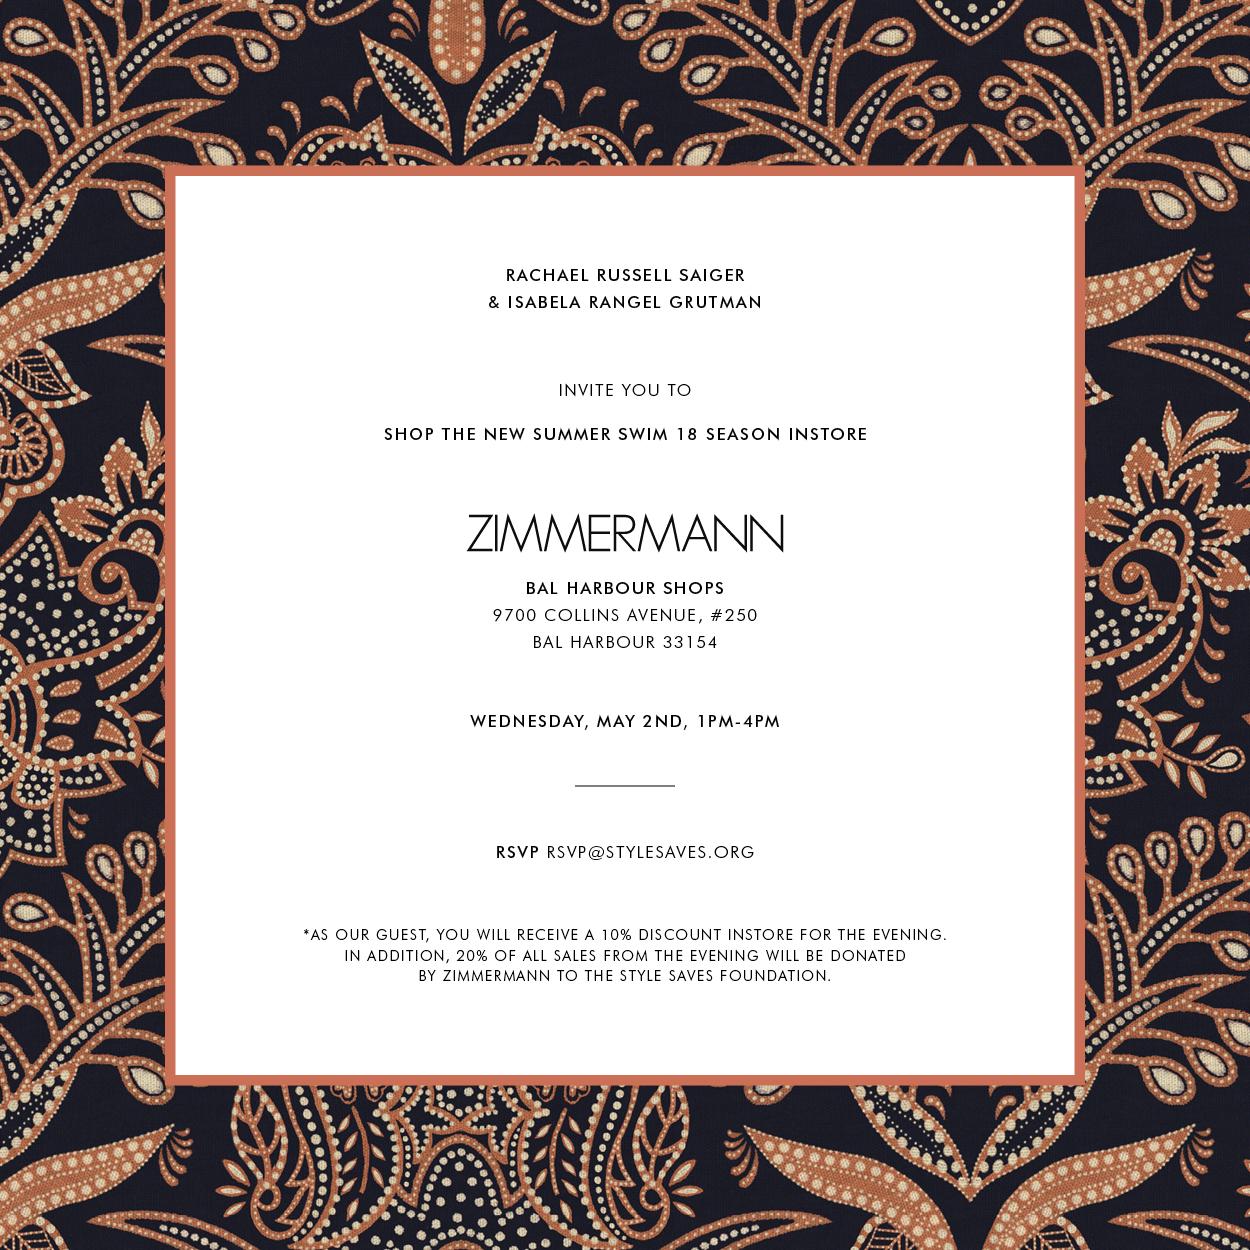 ZIM0306_INSTORE EVENT INVITE_SUMMER SWIM 18_FA-2.jpg